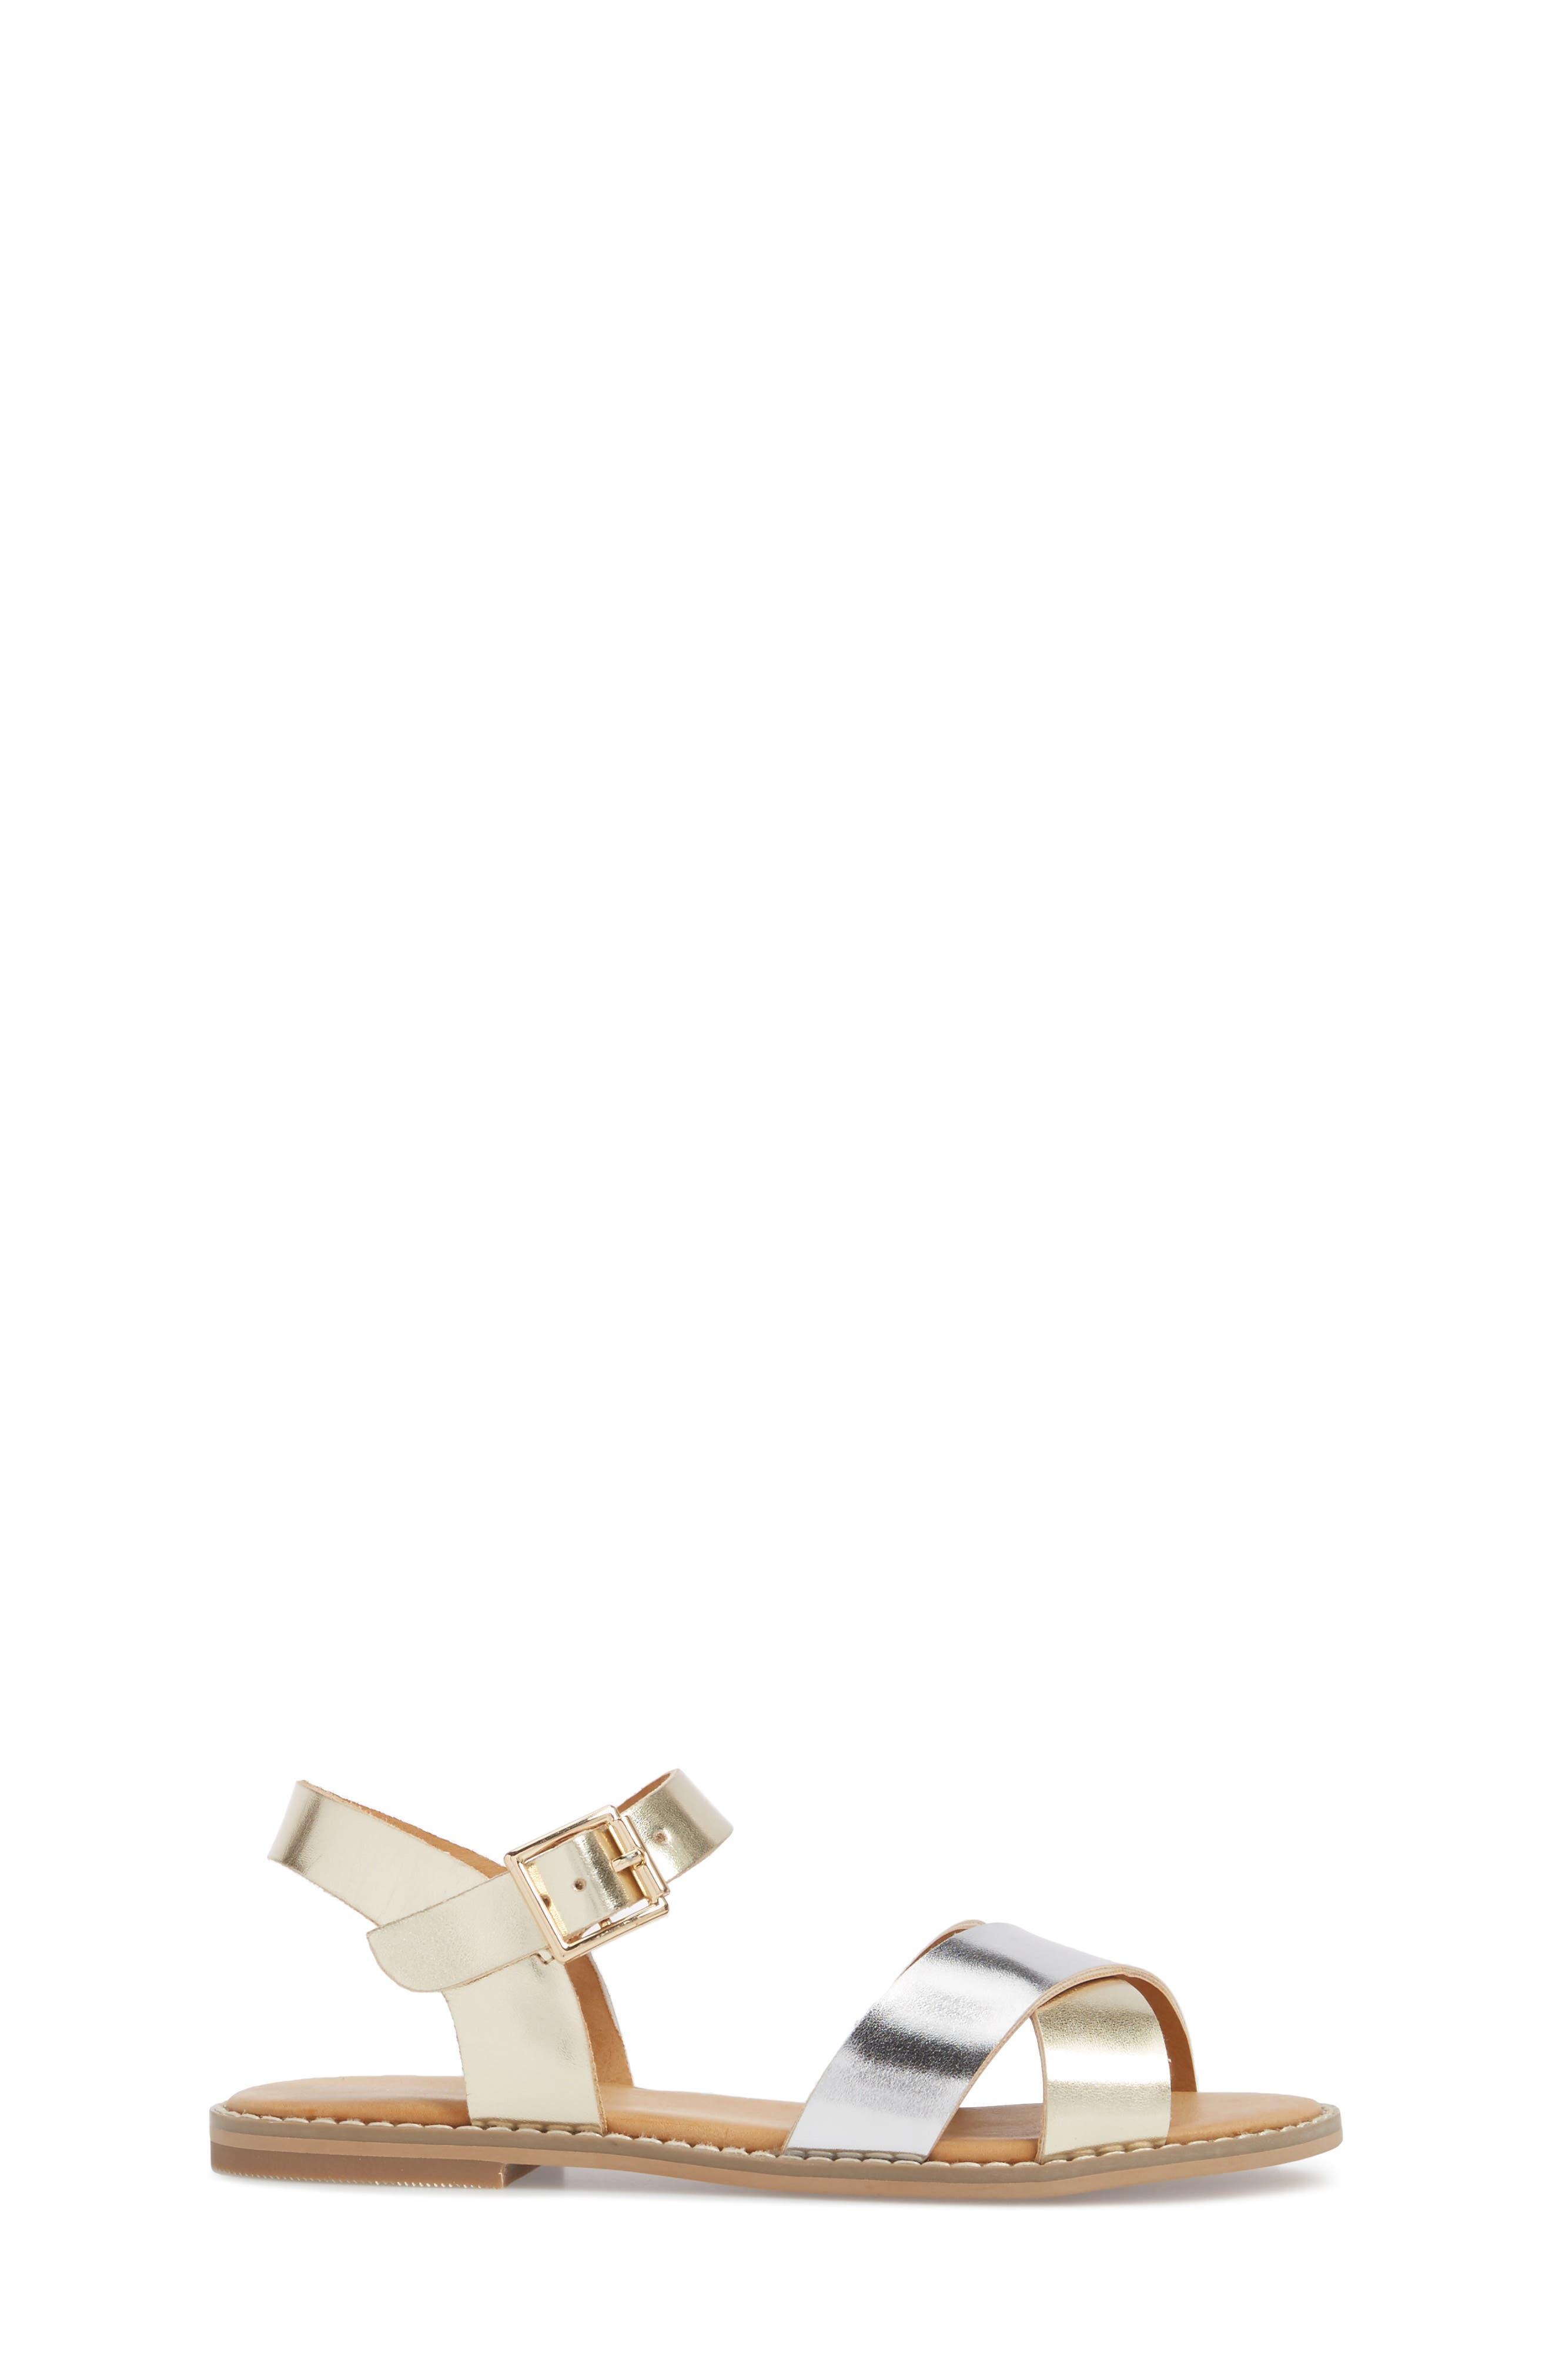 Arya Cross Strap Sandal,                             Alternate thumbnail 3, color,                             SILVER FAUX LEATHER